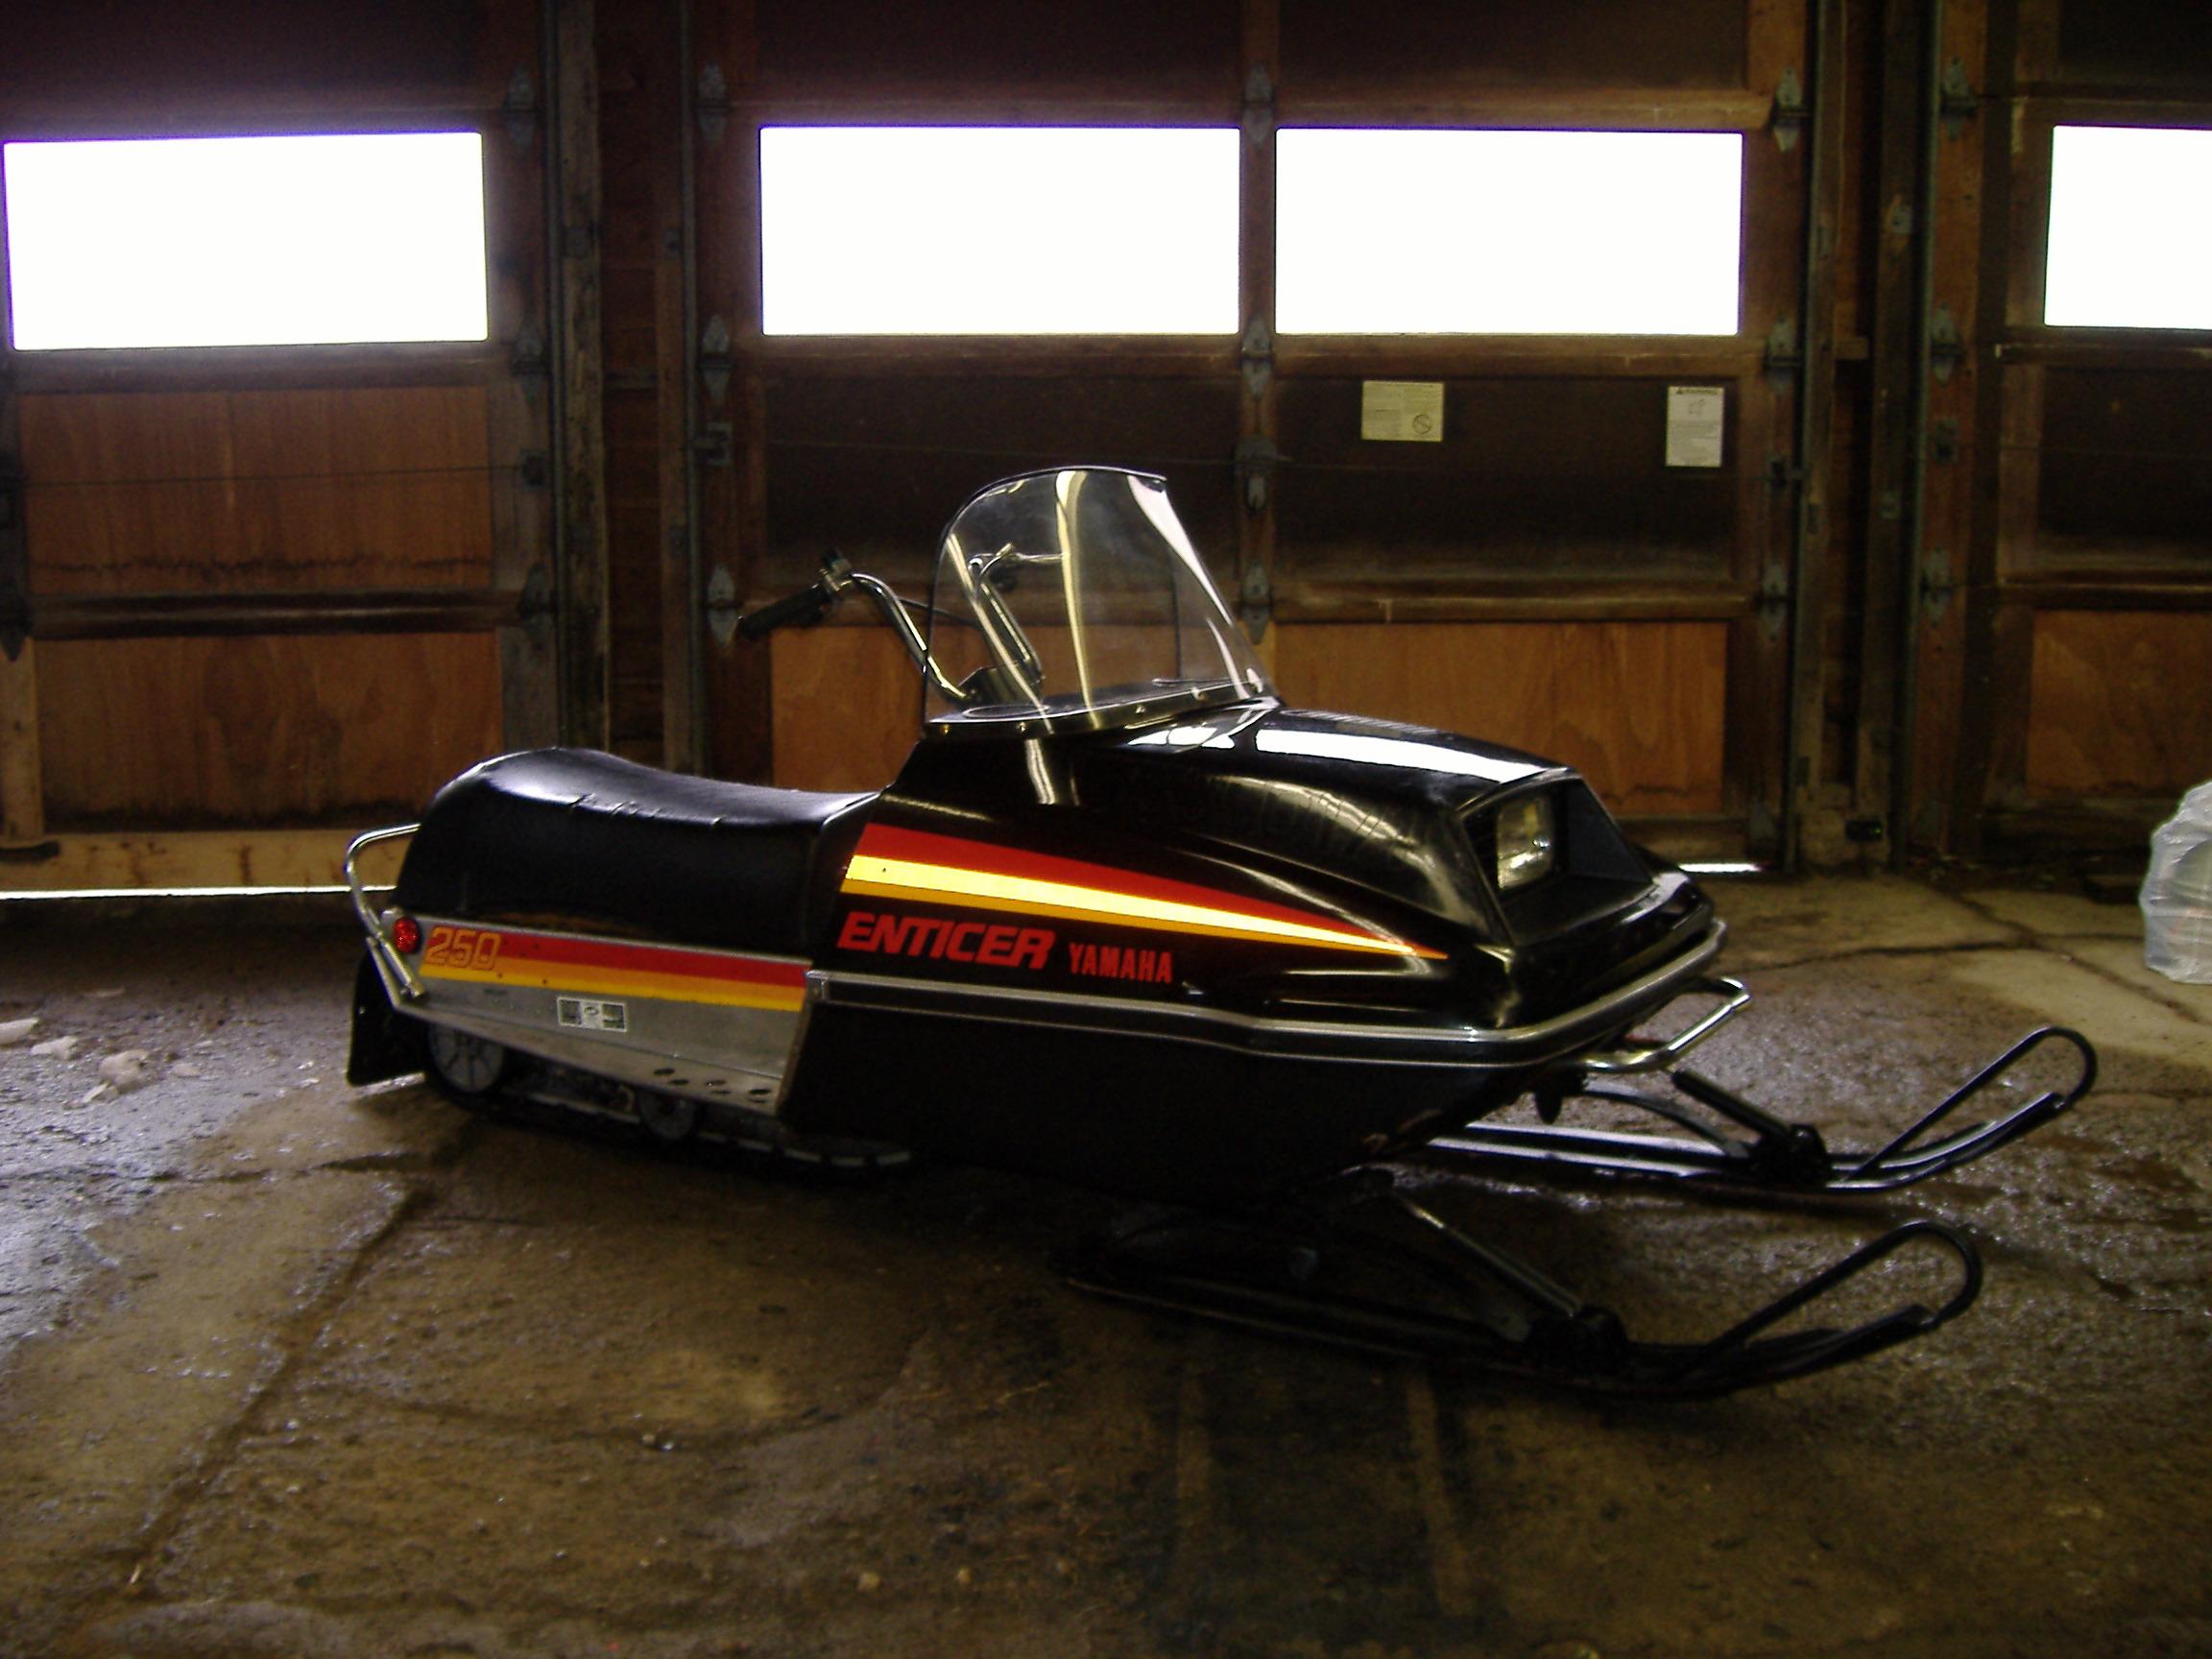 For Sale 1980 Yamaha Enticer 250